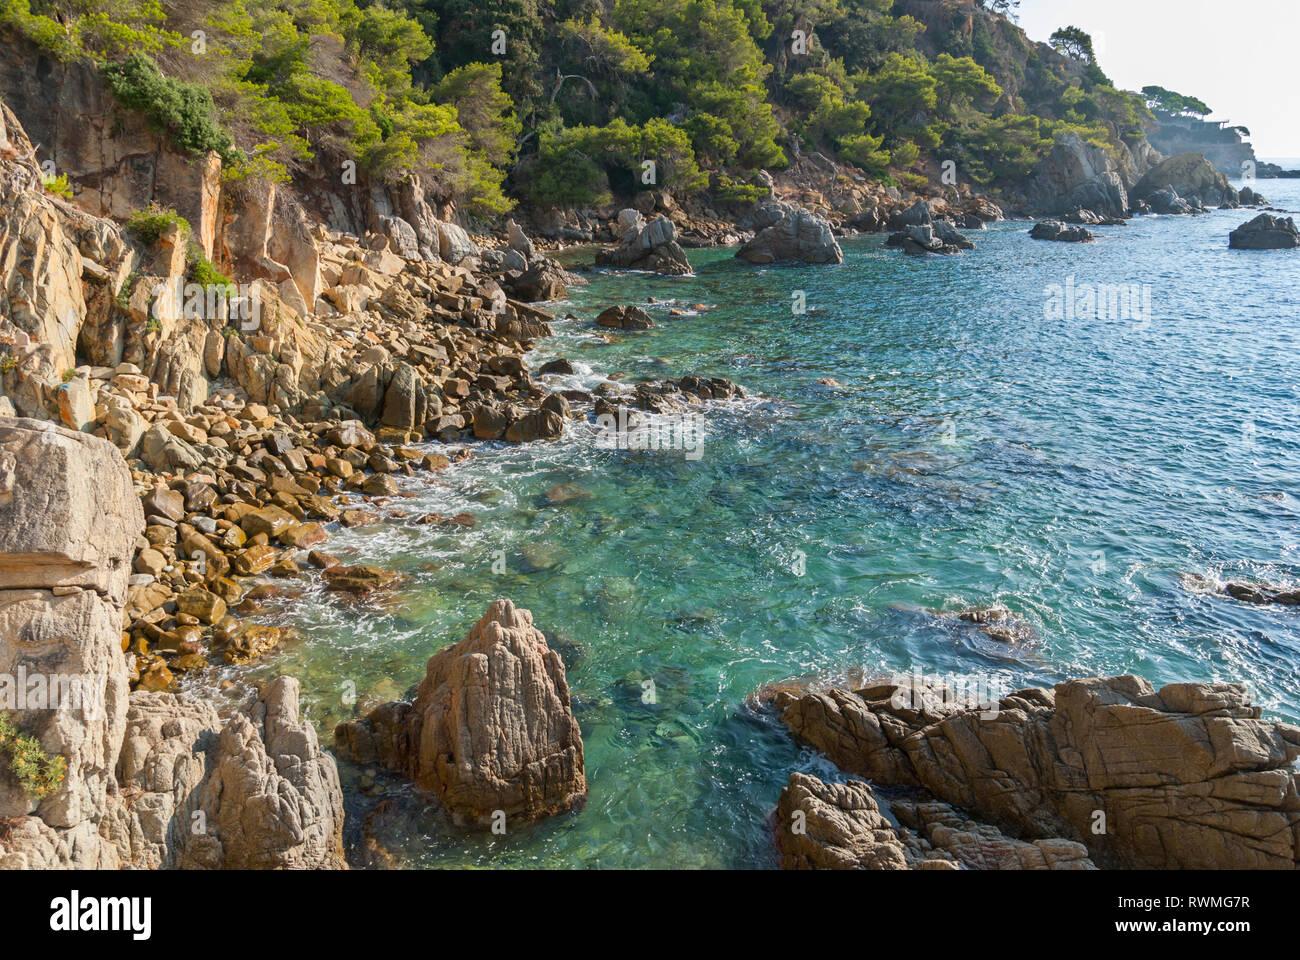 Platja Fenals Fanals Beach in Lloret de Mar at Costa Brava of Catalonia Girona Spain - Stock Image